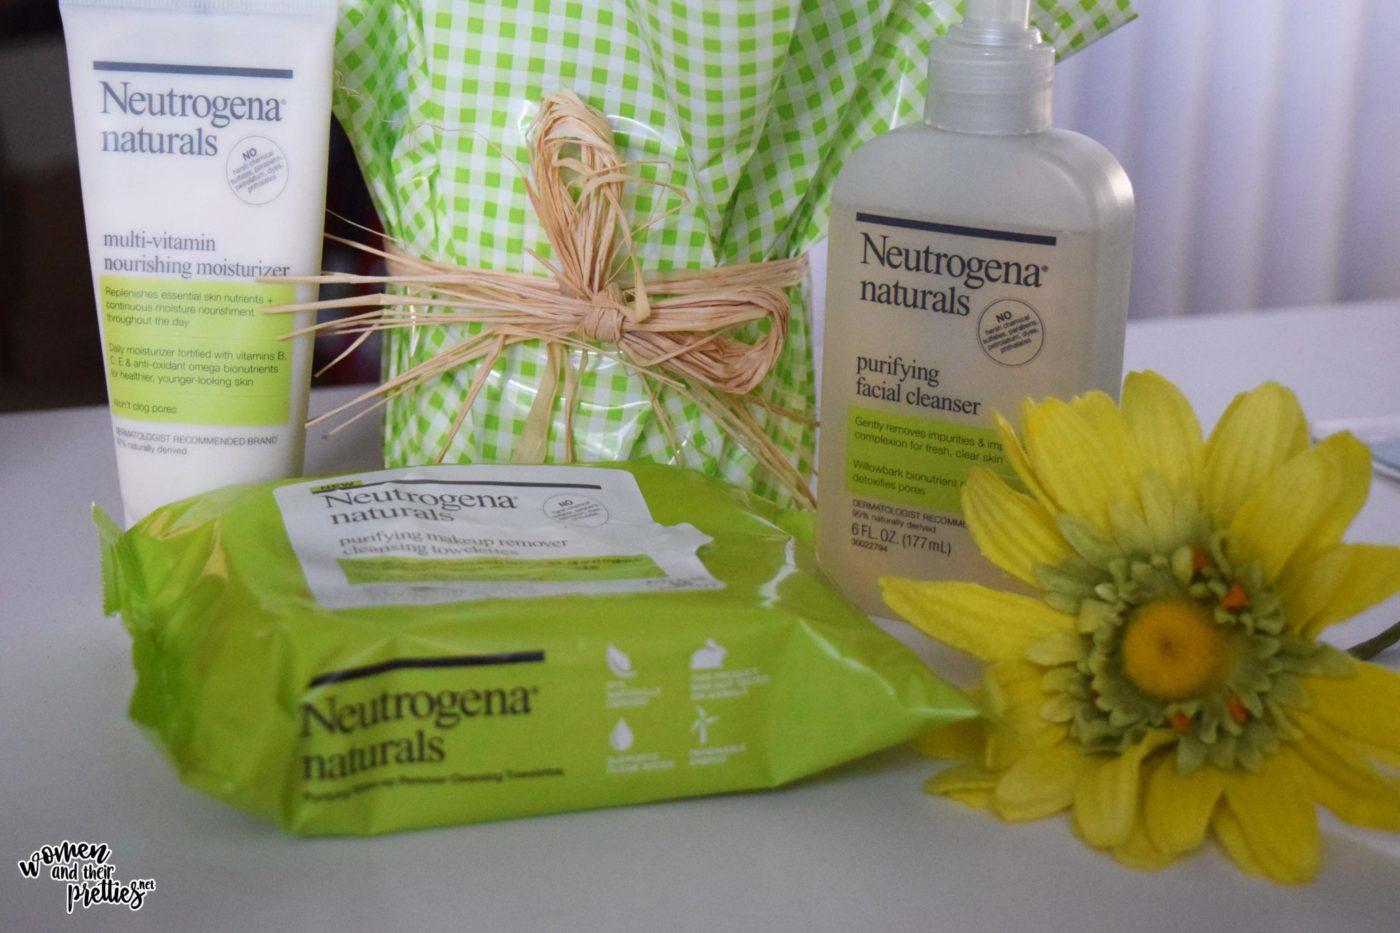 REVIEW: Neutrogena Naturals is like My Personal Skin Repairing Team | Women and Their Pretties